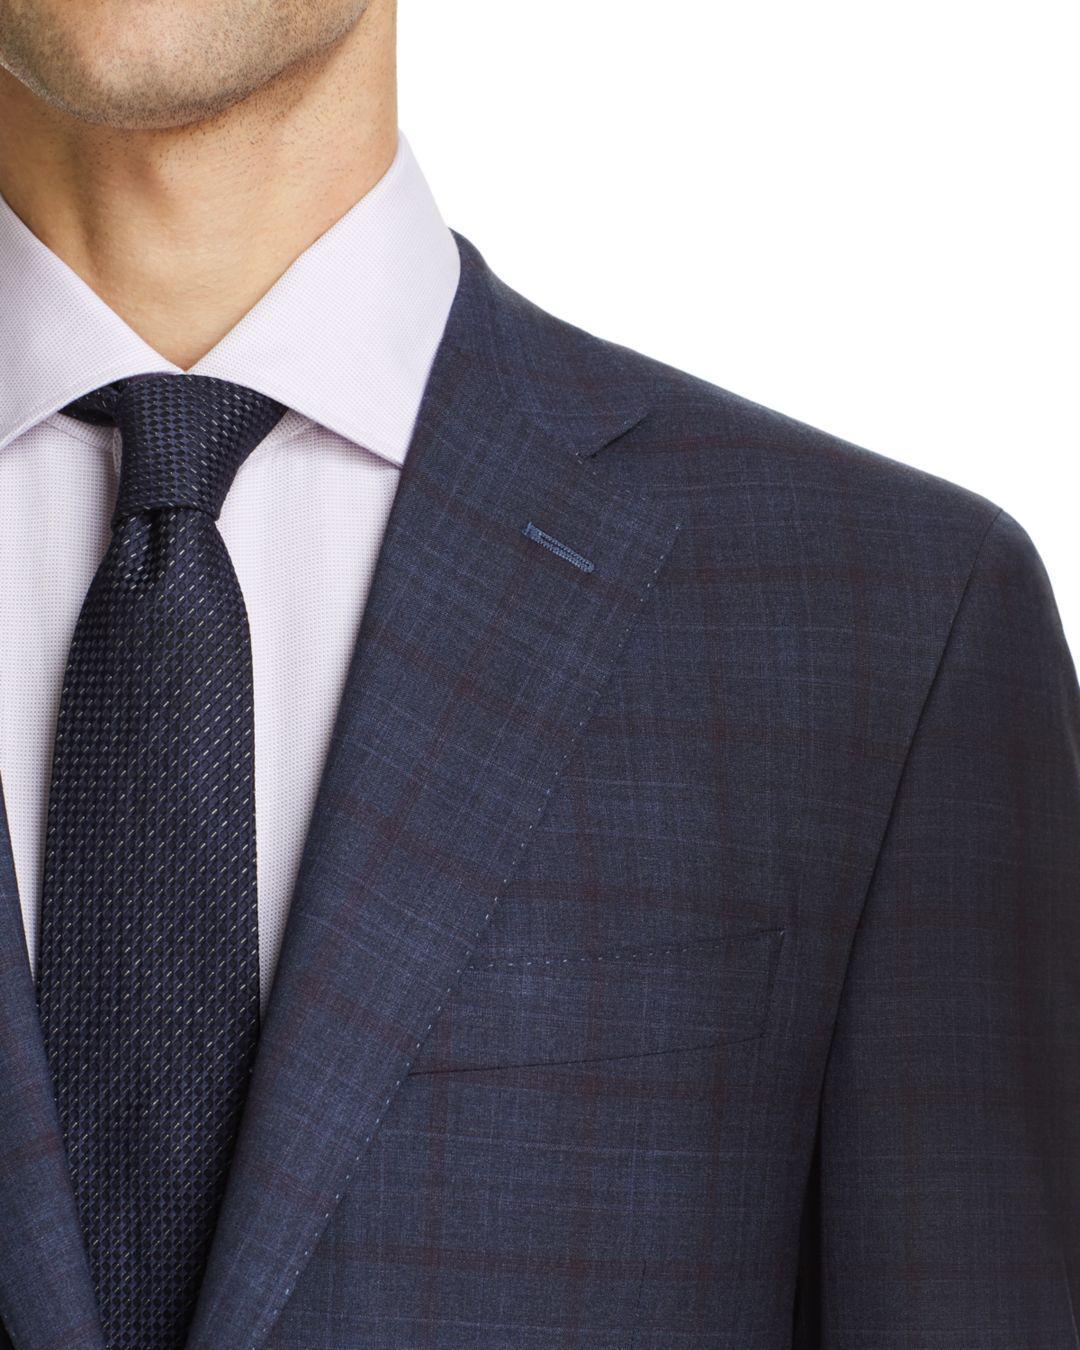 b620548002e Canali Blue Tonal Plaid Siena Classic Fit Suit for men. View fullscreen